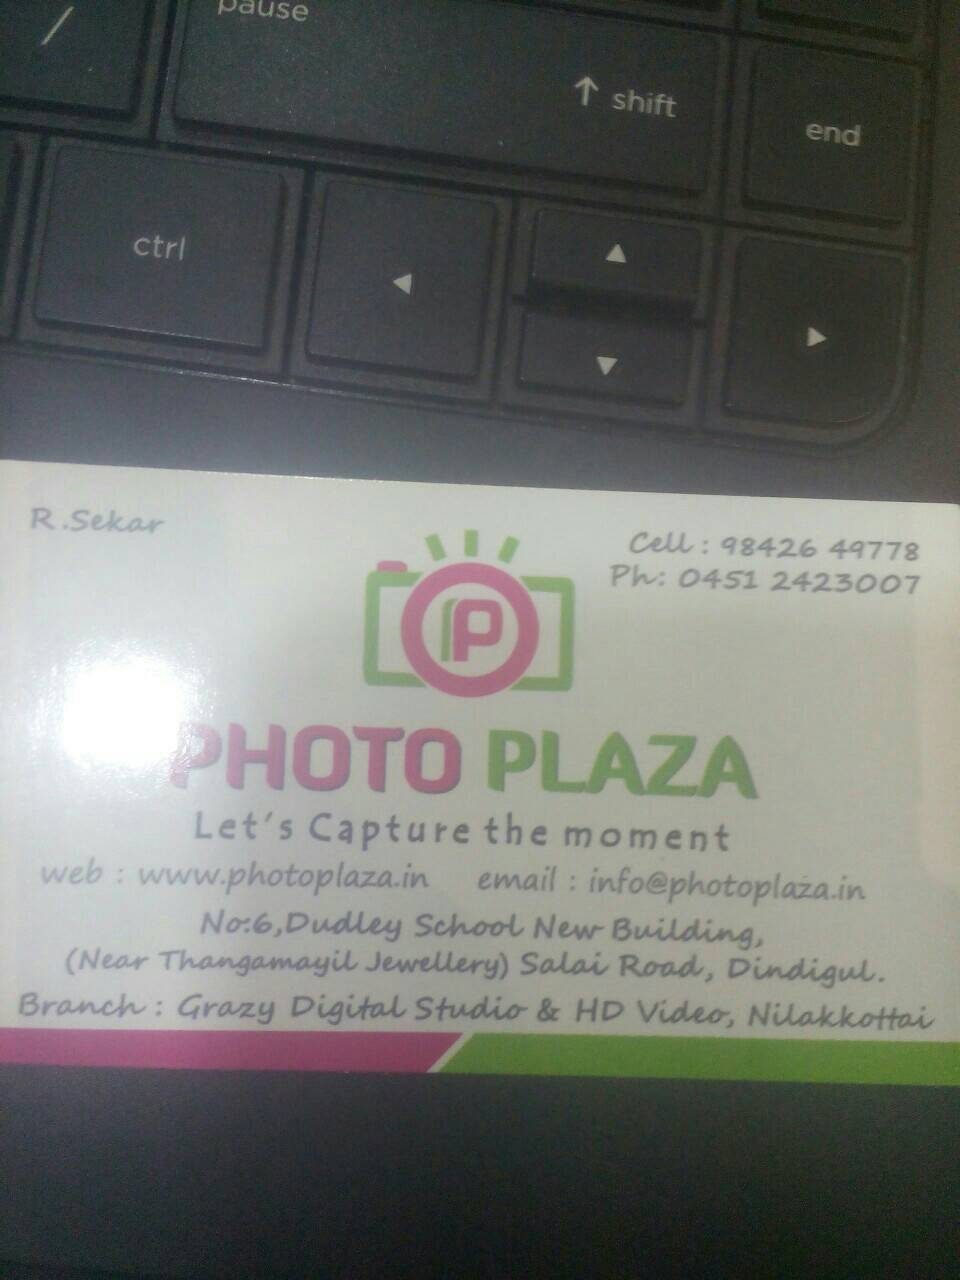 Photoplaza